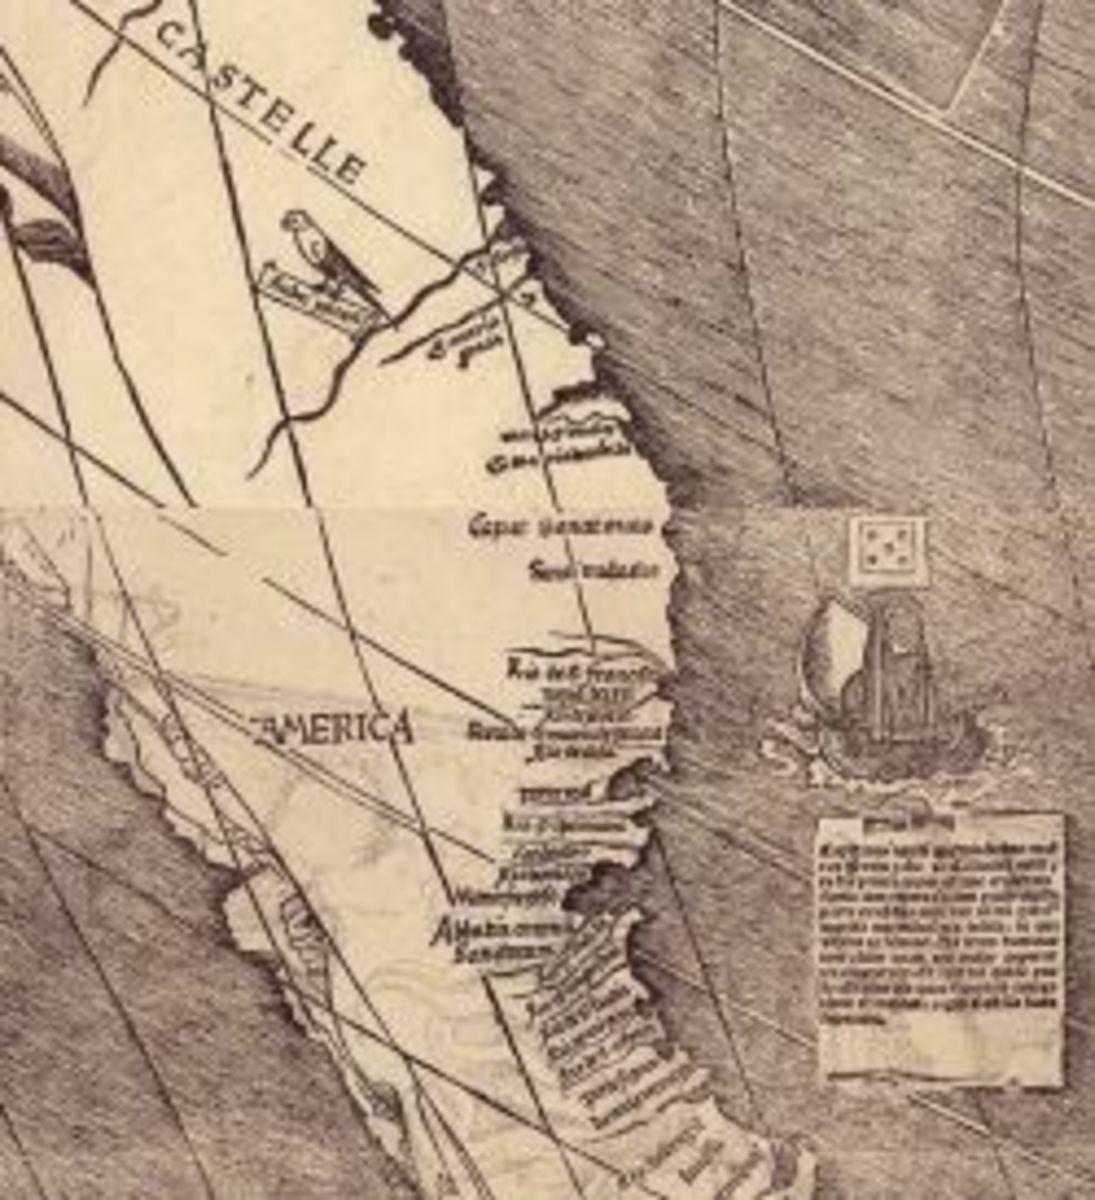 library of congress waldseemuller map